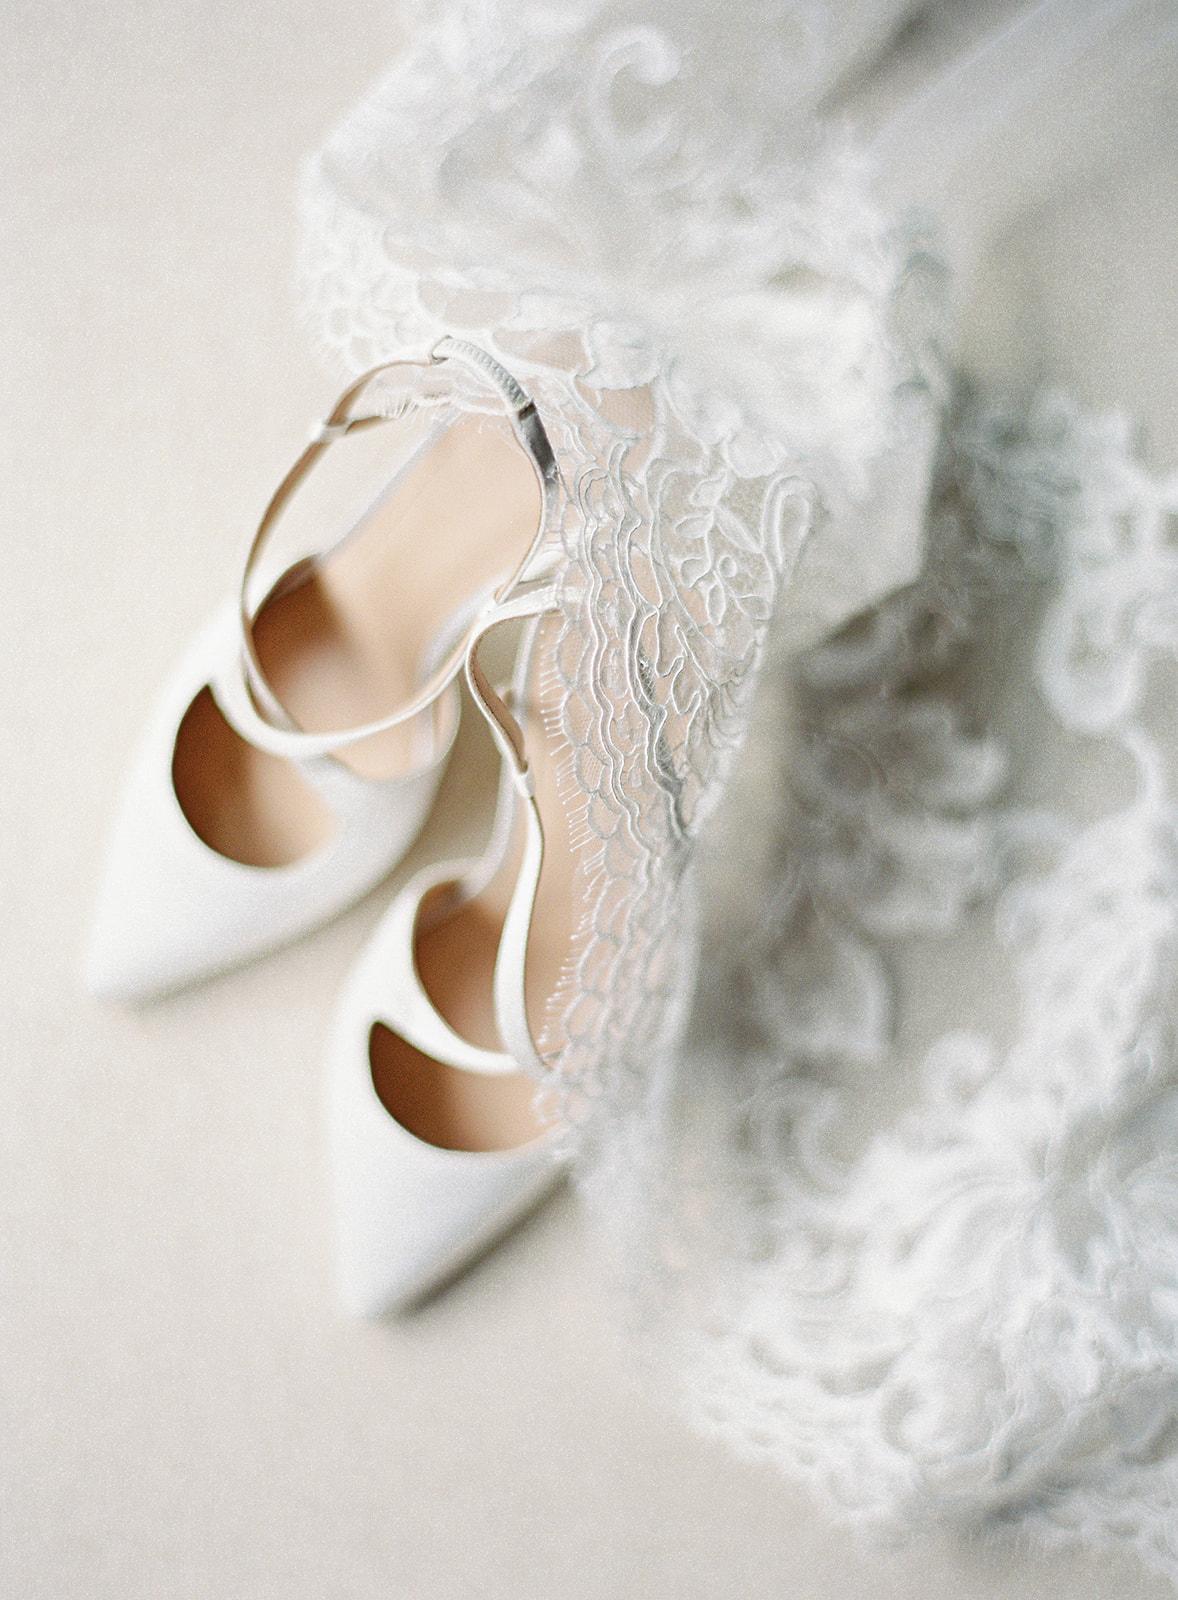 bride wedding shoes chantilly lace veil